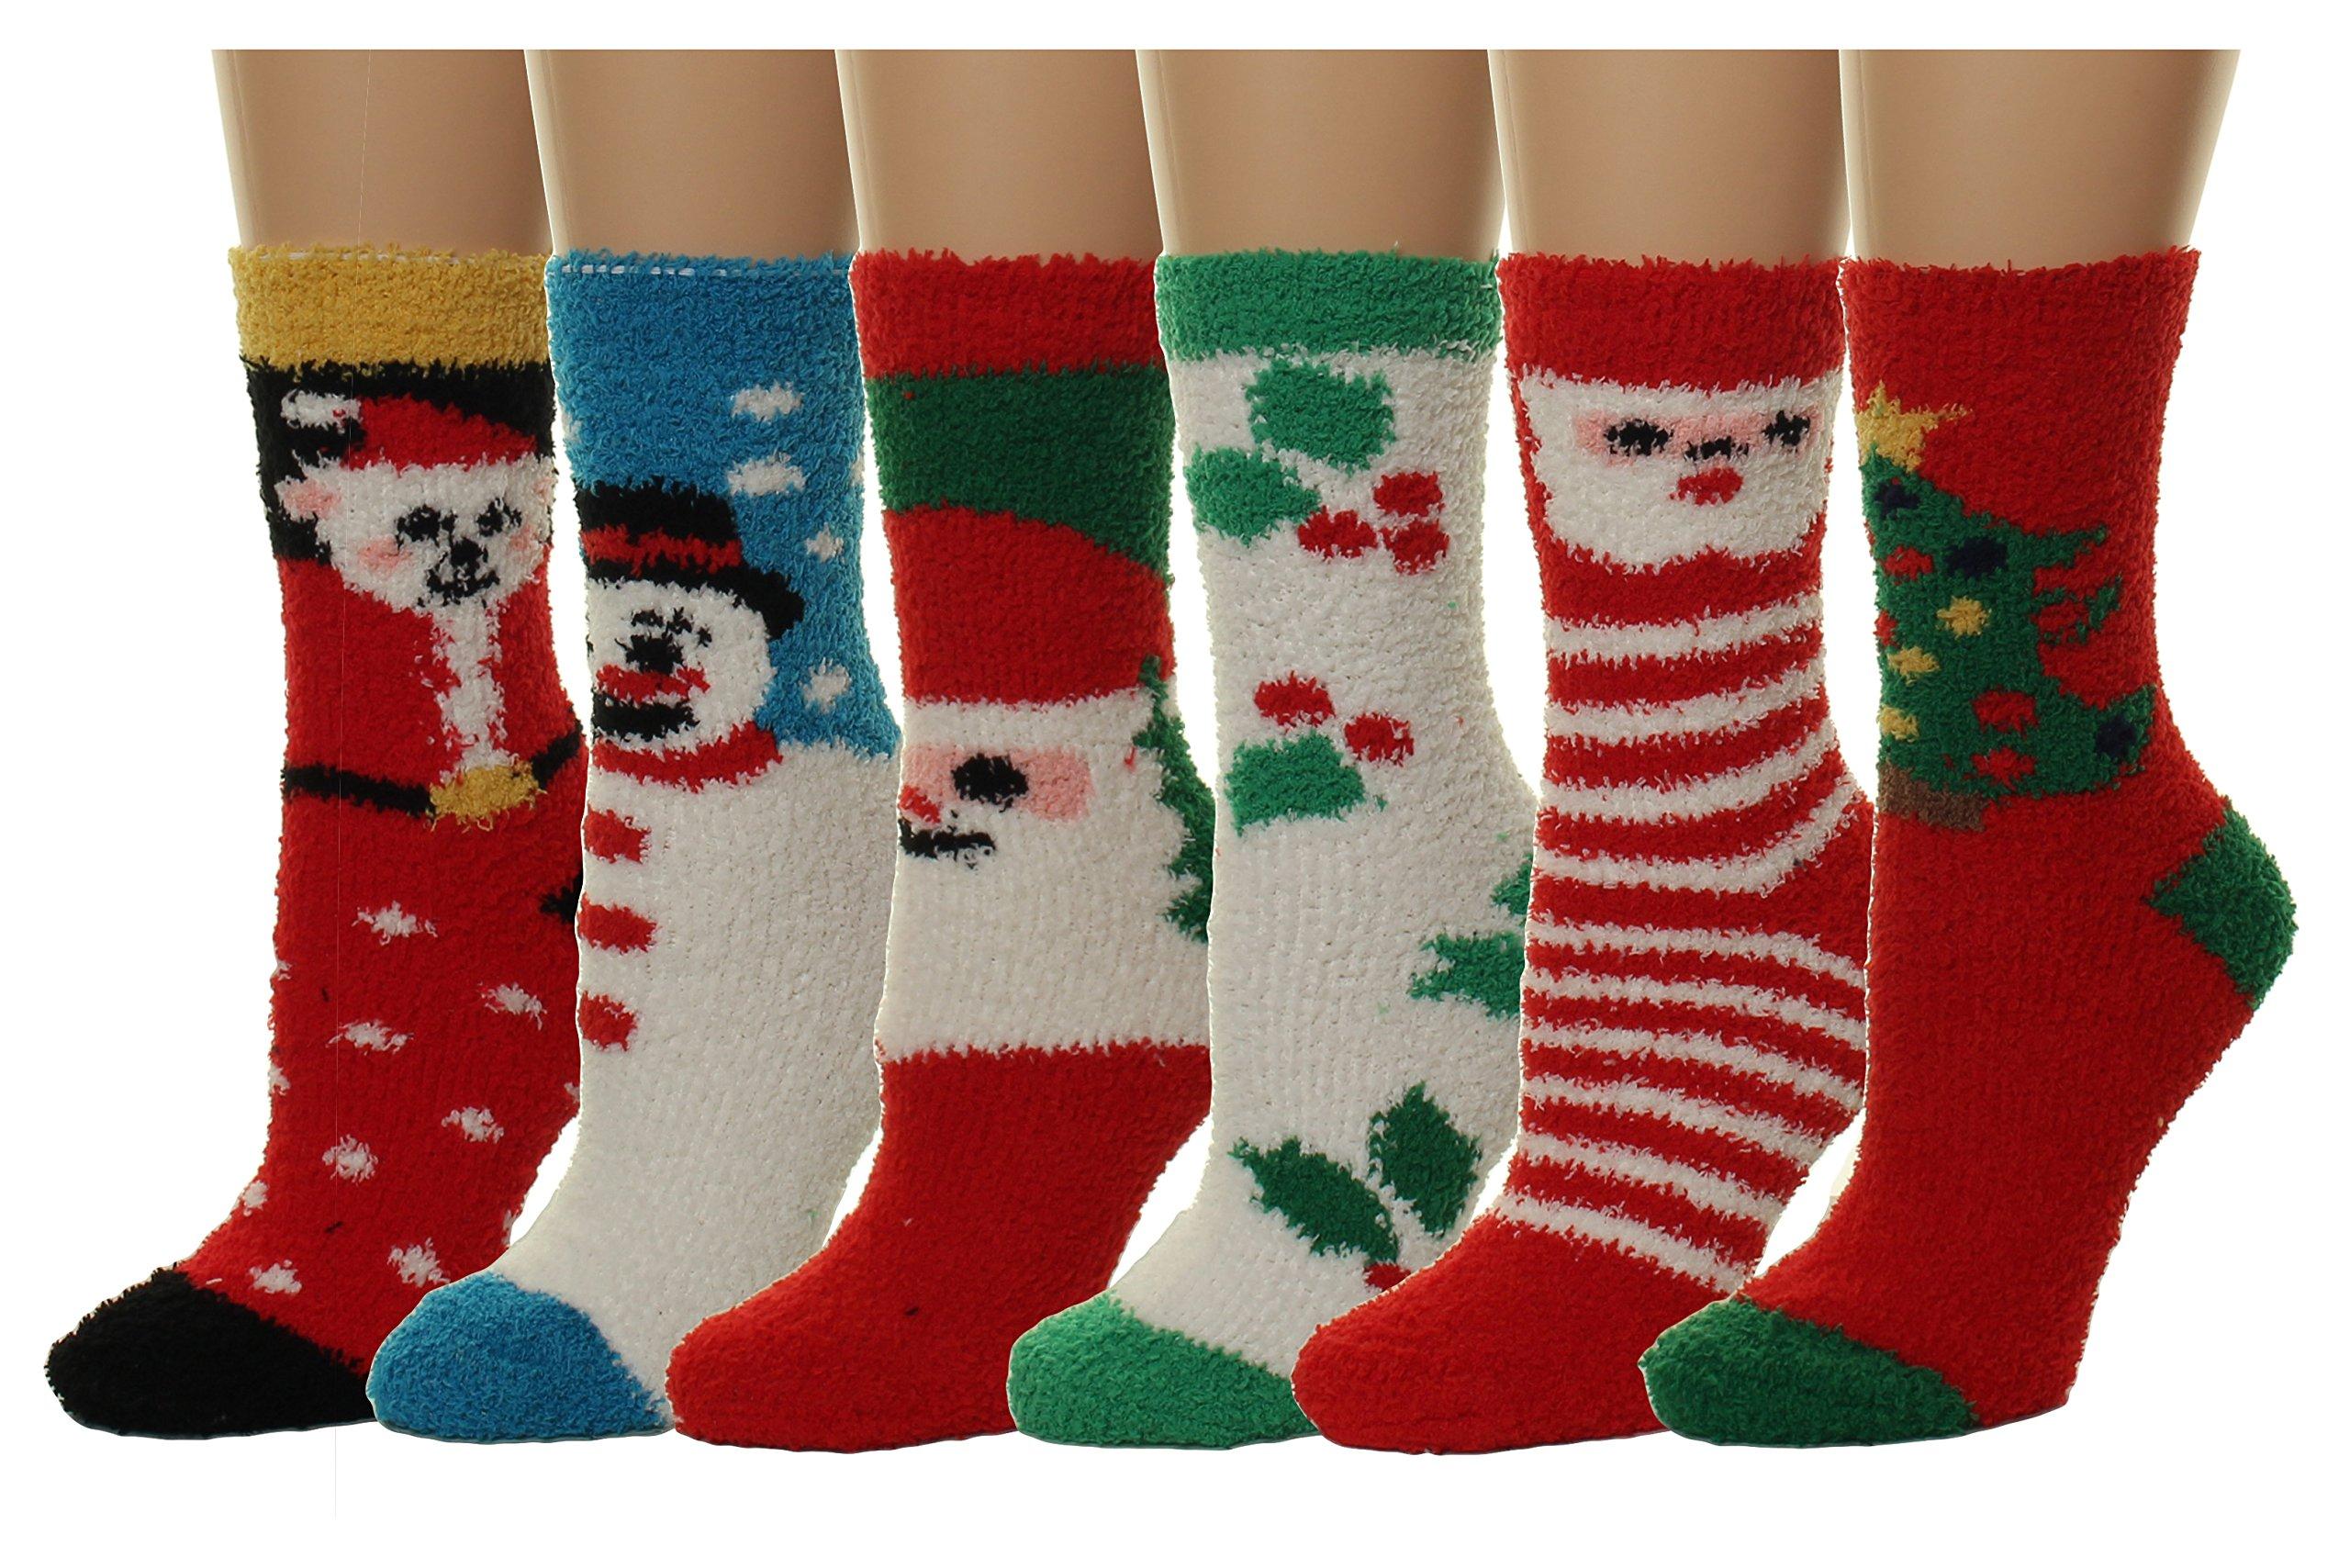 Gilbin's 6 Pairs Women's Supersoft Fuzzy Socks. Size: 9-11 X-mas Holiday Socks